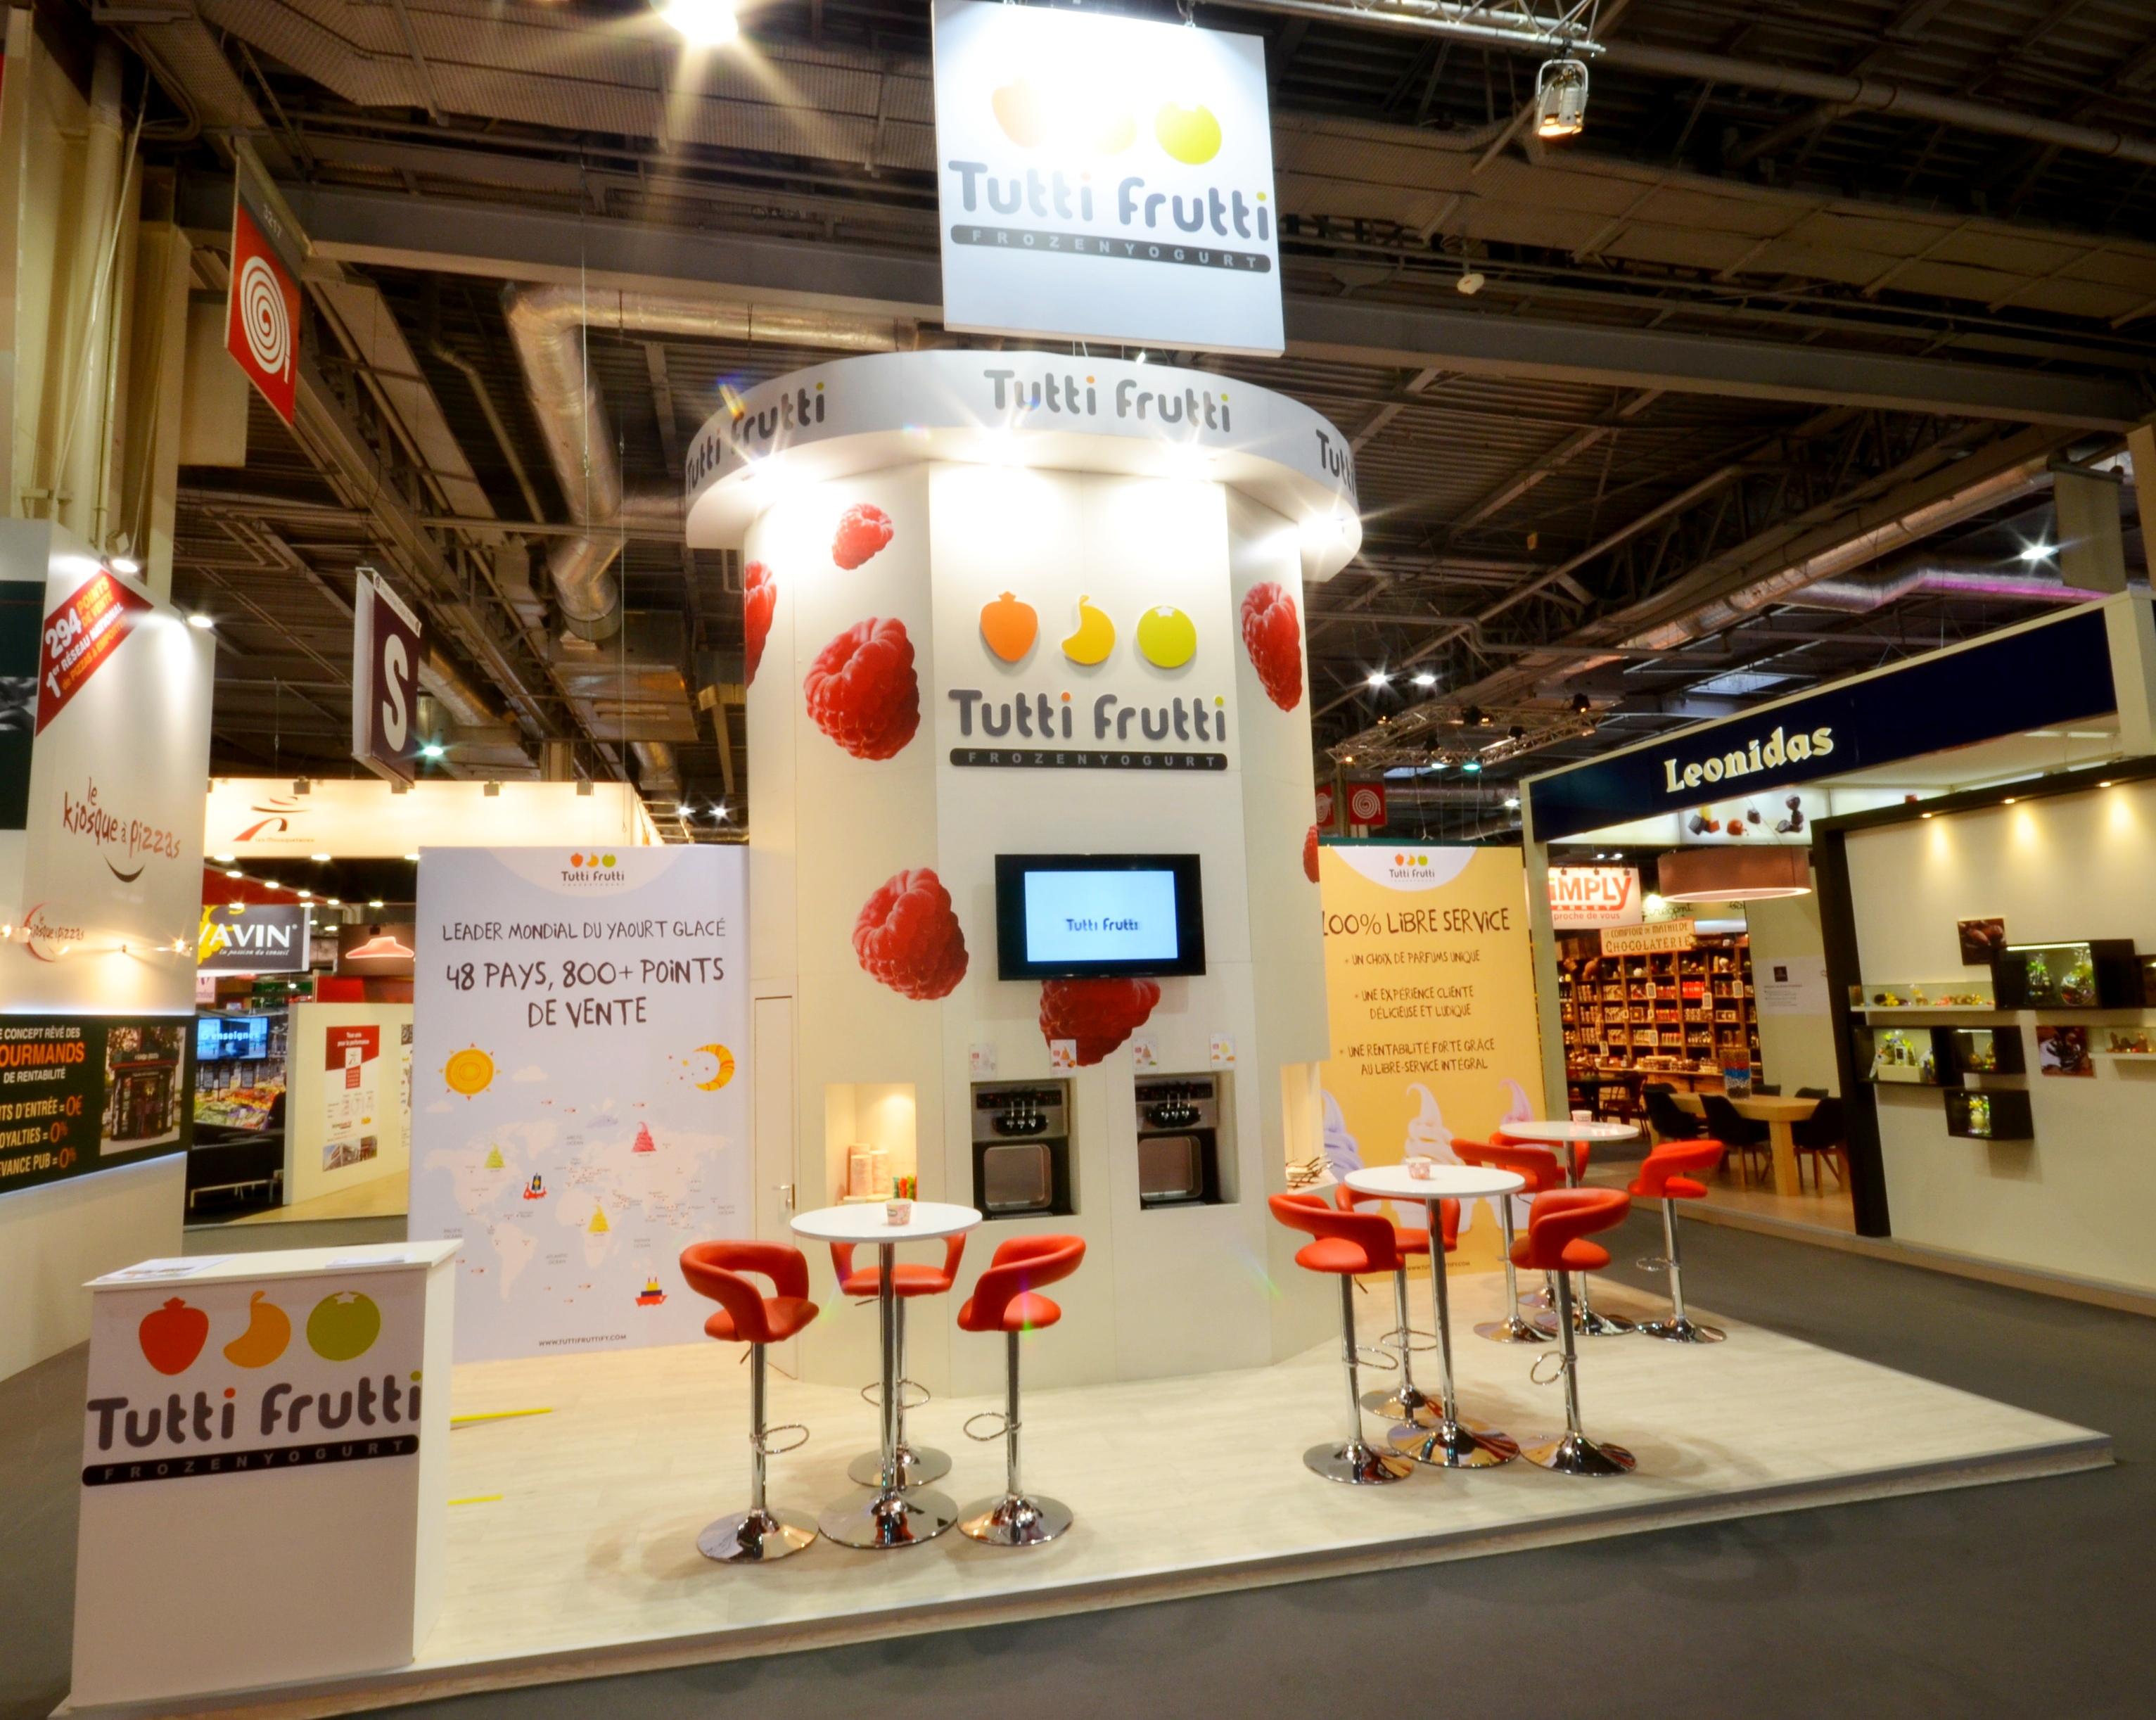 Stand Tutti Frutti by aveca salon Franchise Expo